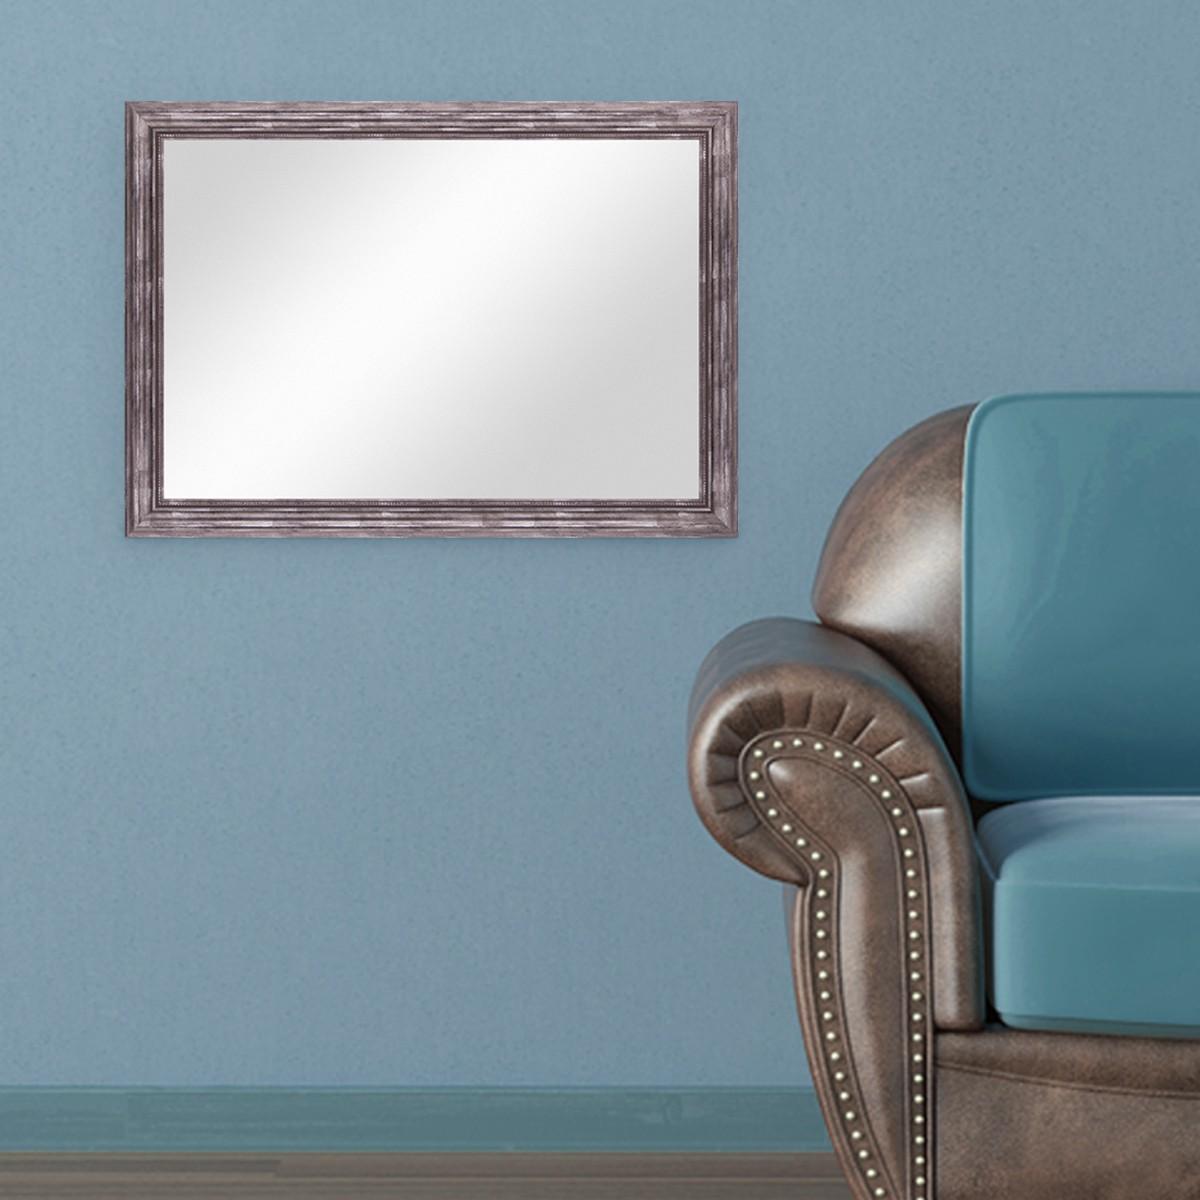 wand spiegel 60x80 cm im massivholz rahmen barock stil antik silber spiegelfl che 50x70 cm spiegel. Black Bedroom Furniture Sets. Home Design Ideas